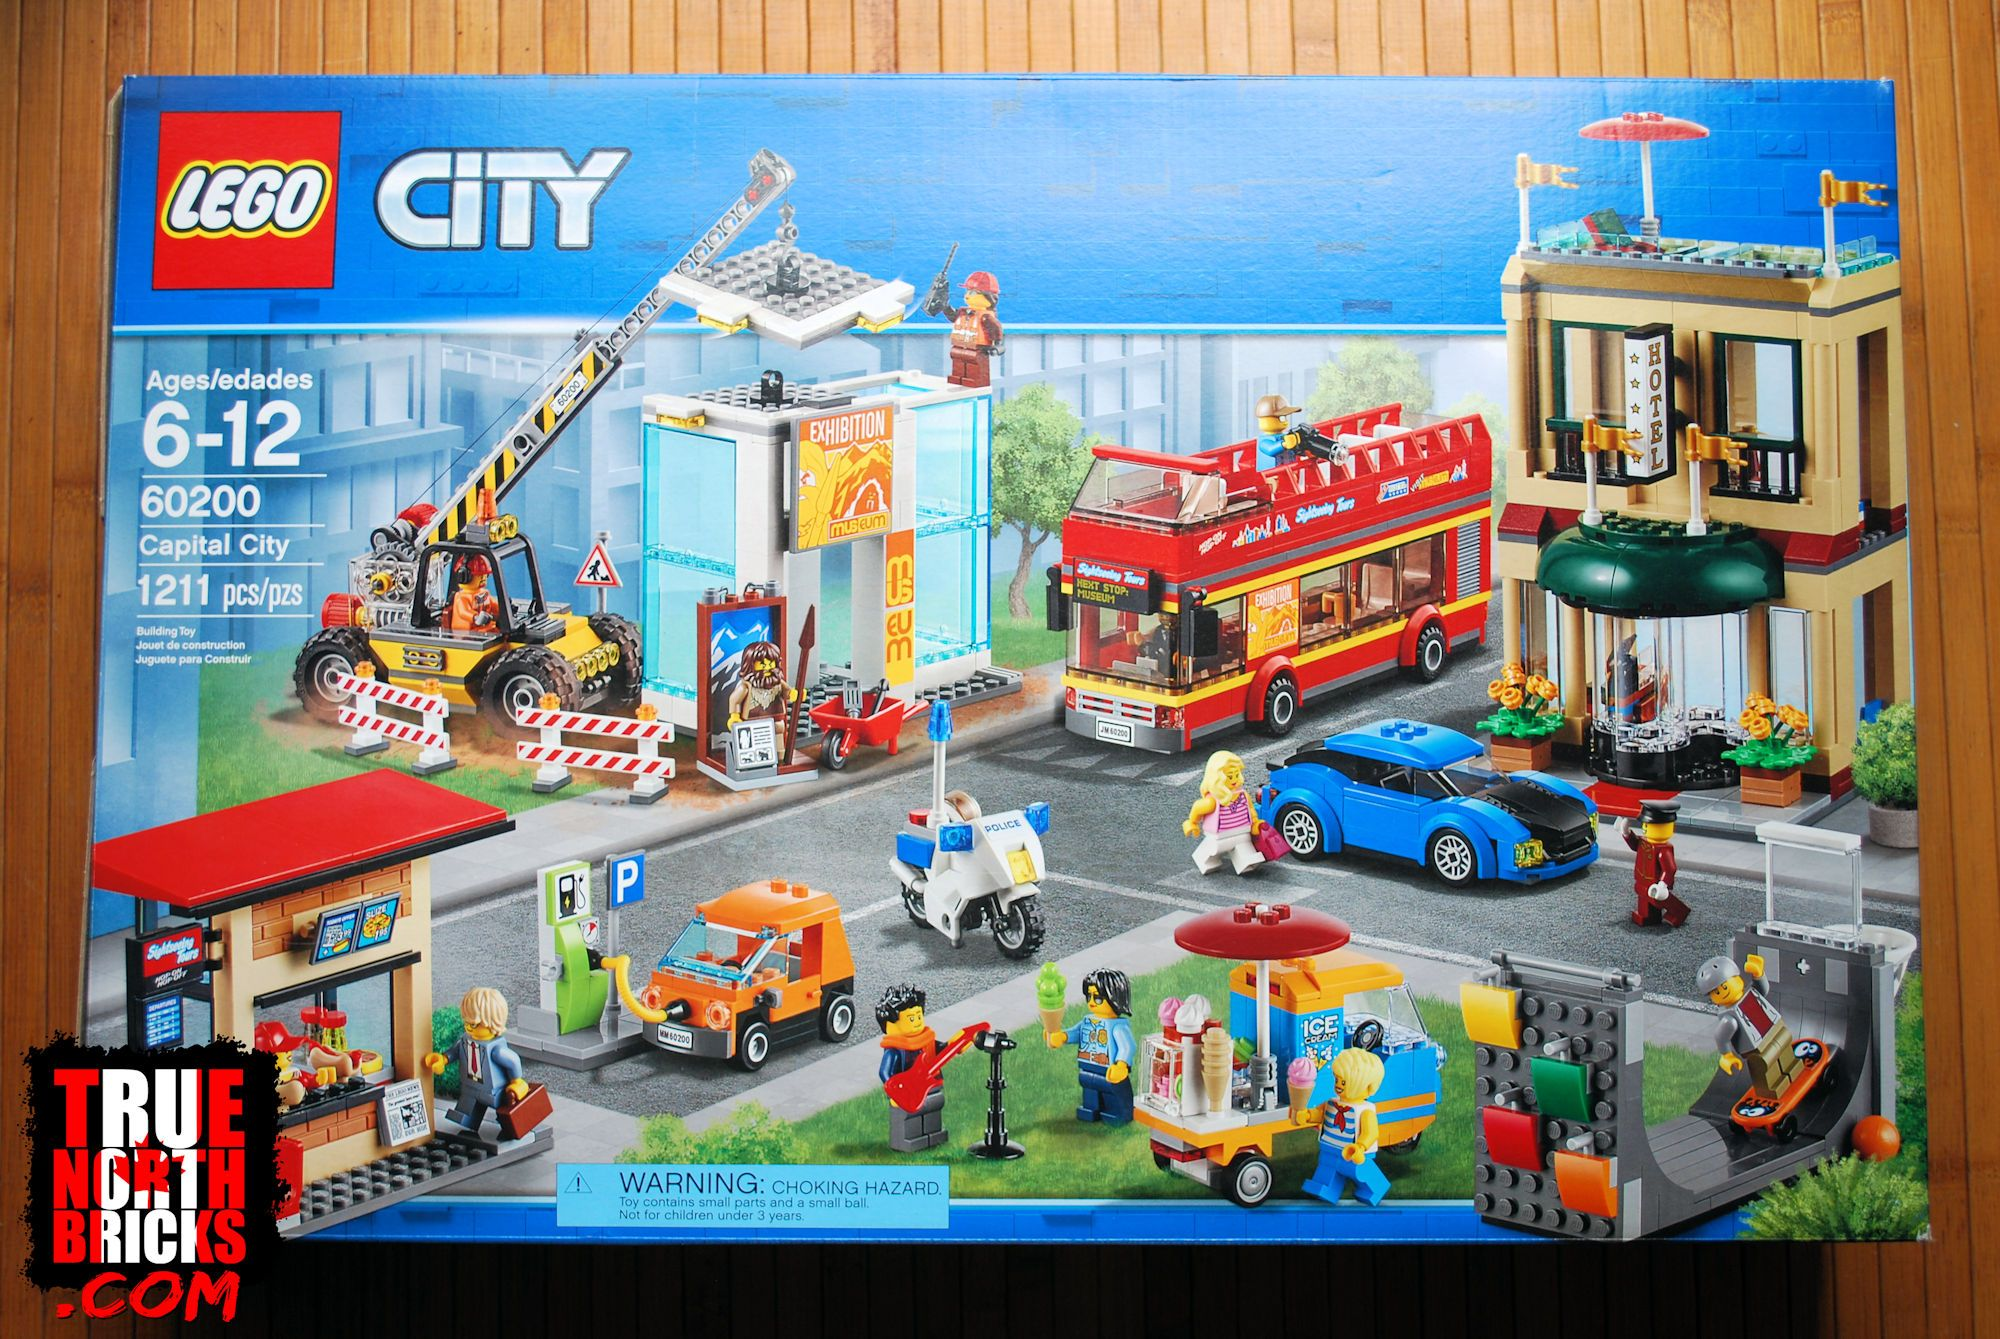 Capital City 60200 Lego Set Review True North Bricks In 2020 Lego City Lego Sets Lego City Police